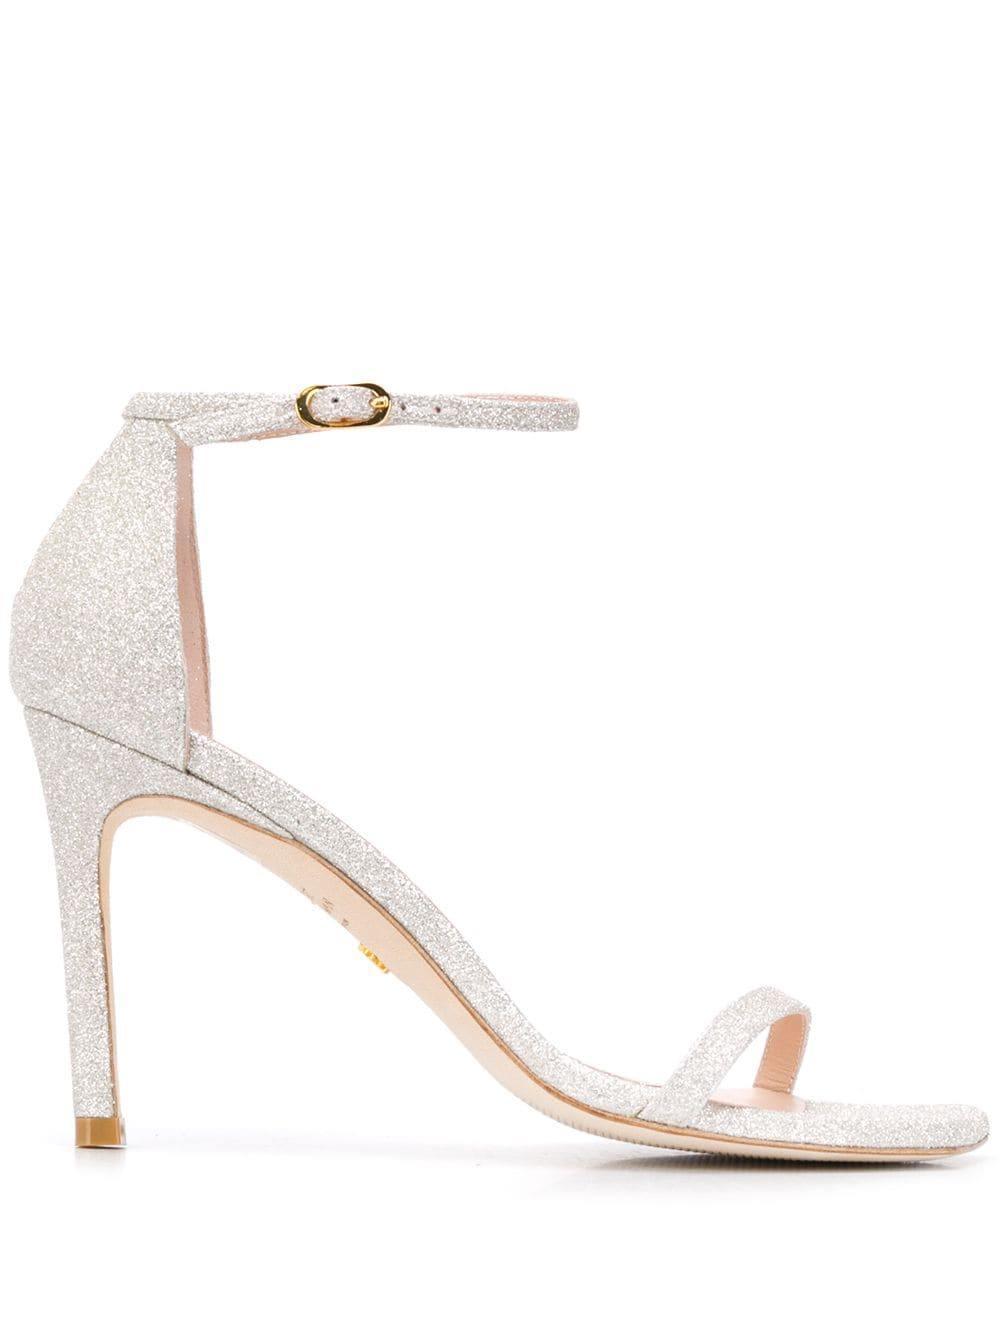 Amelina 95mm Glitter Sandal